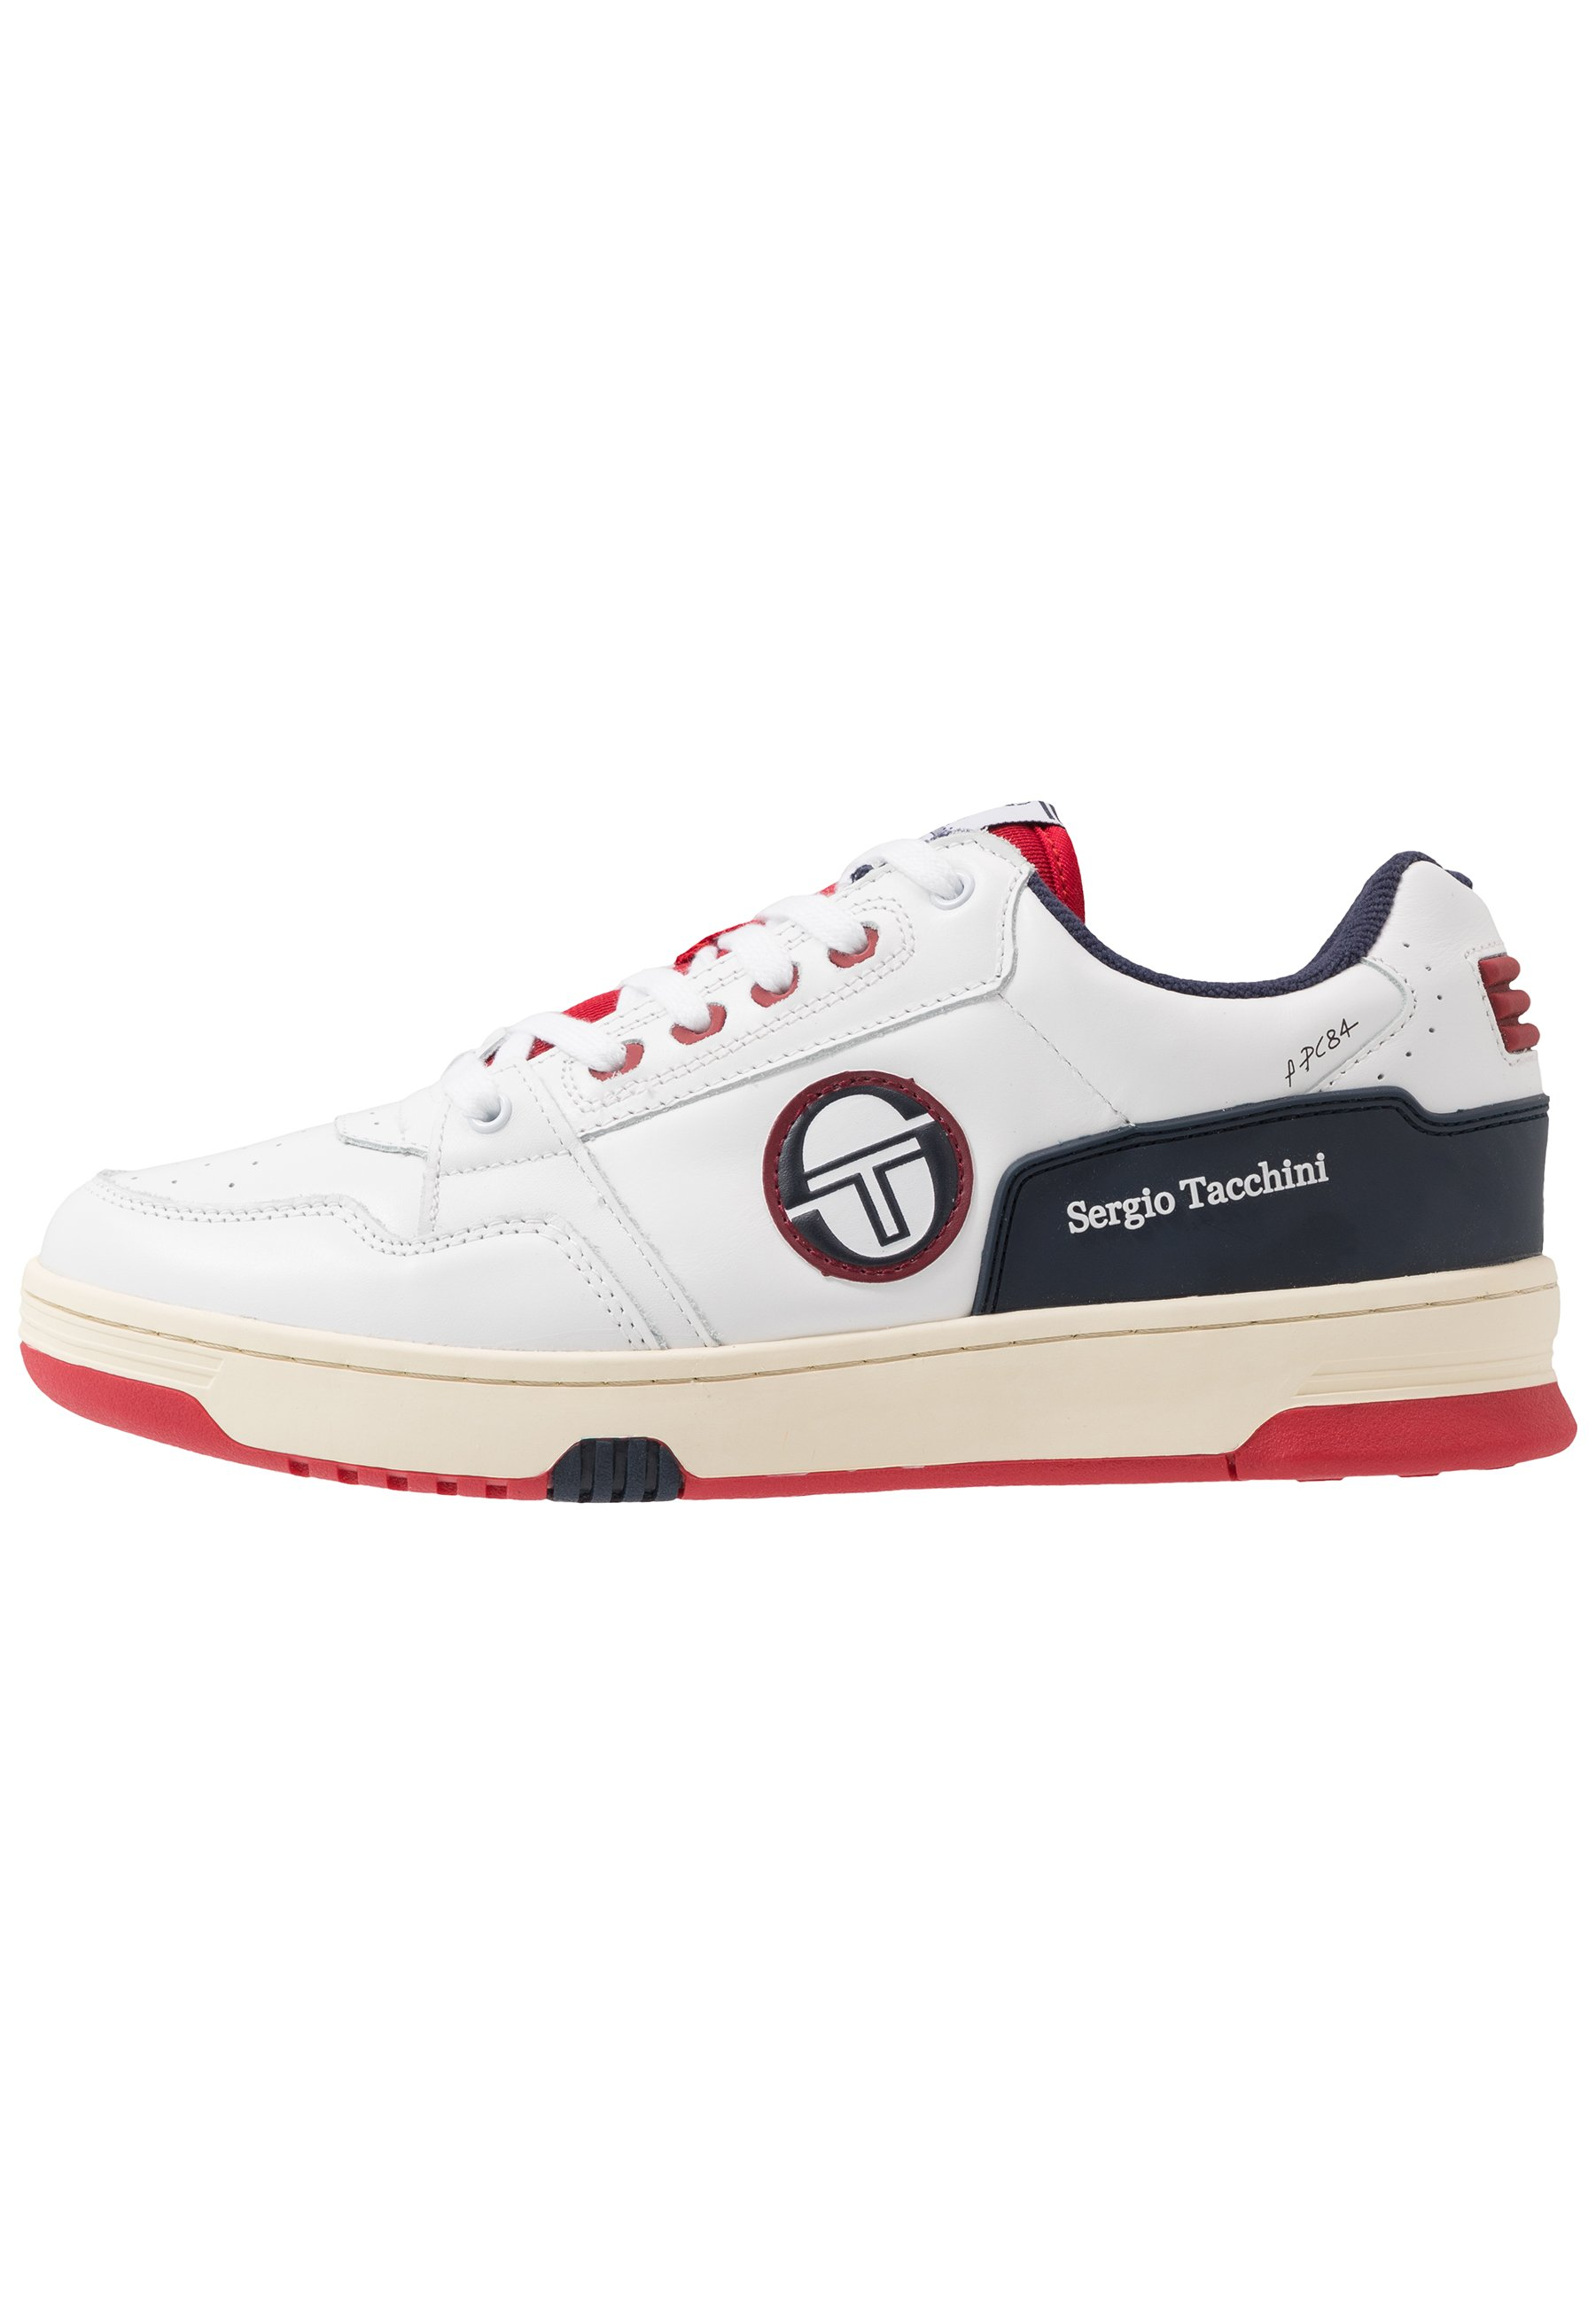 Sergio tacchini Sneakers | Herresko | Kjøp sko på nett hos